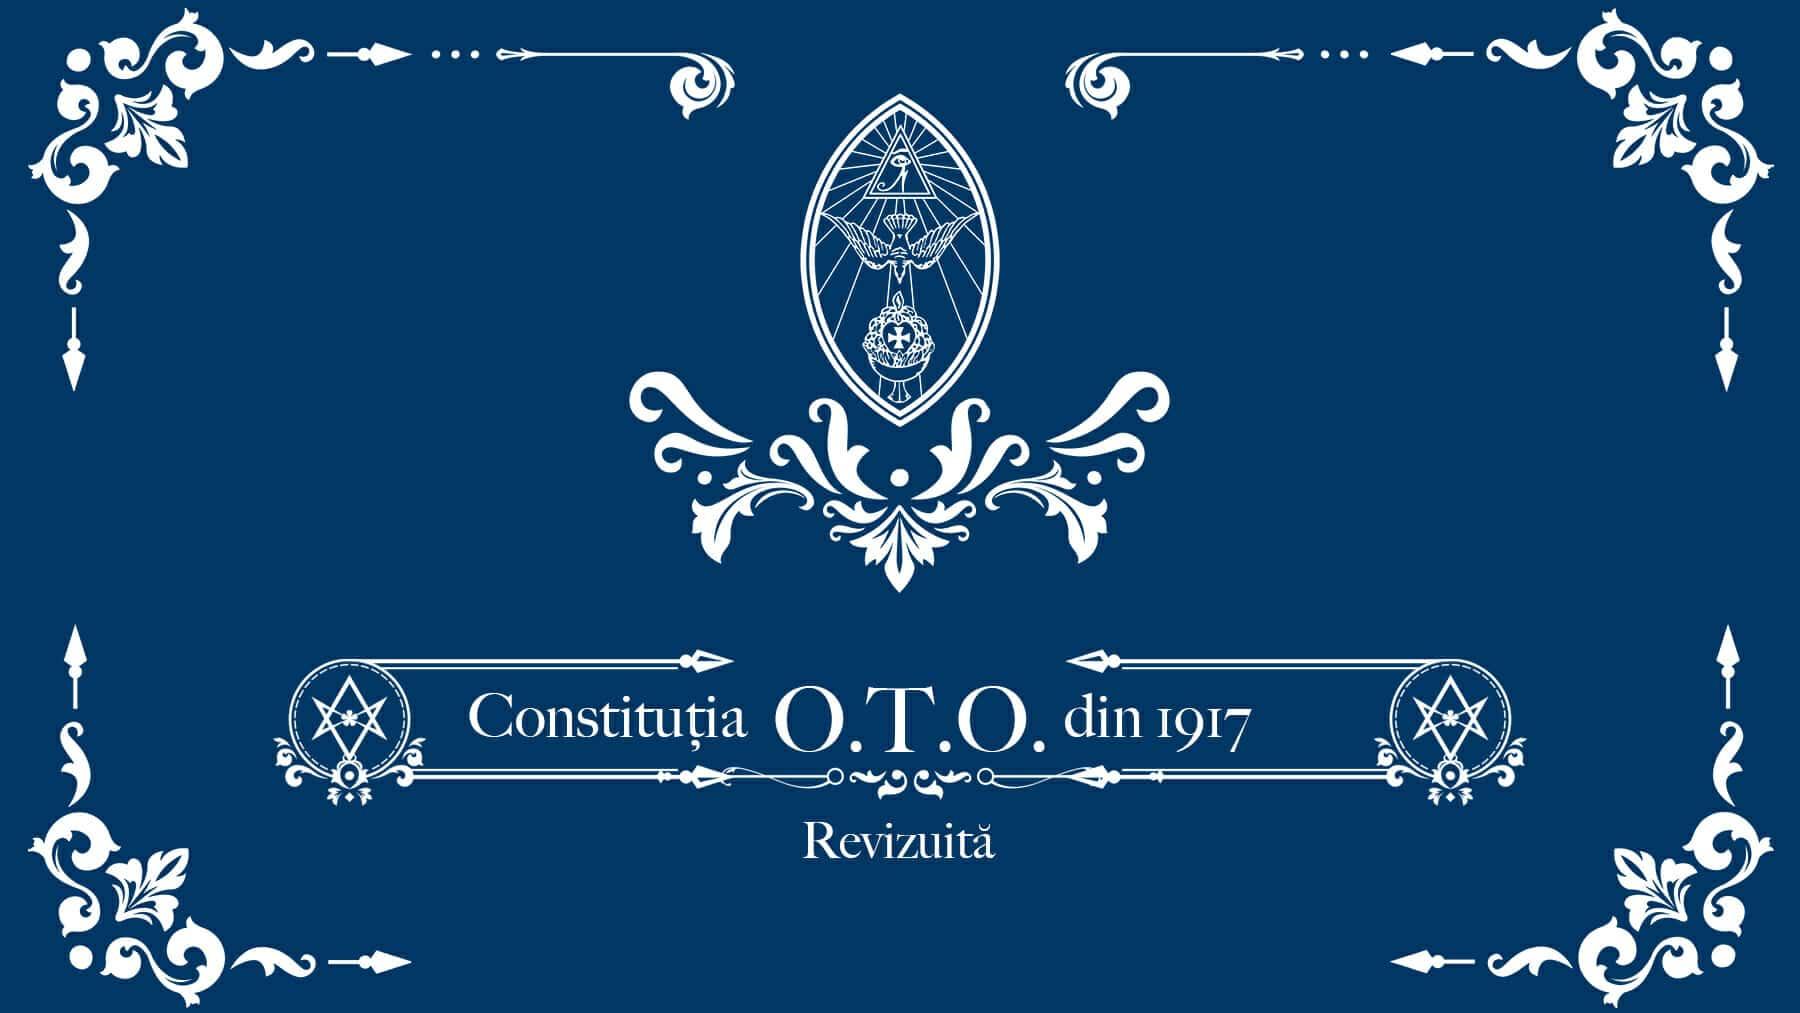 Constituția O.T.O. din 1917 Revizuită